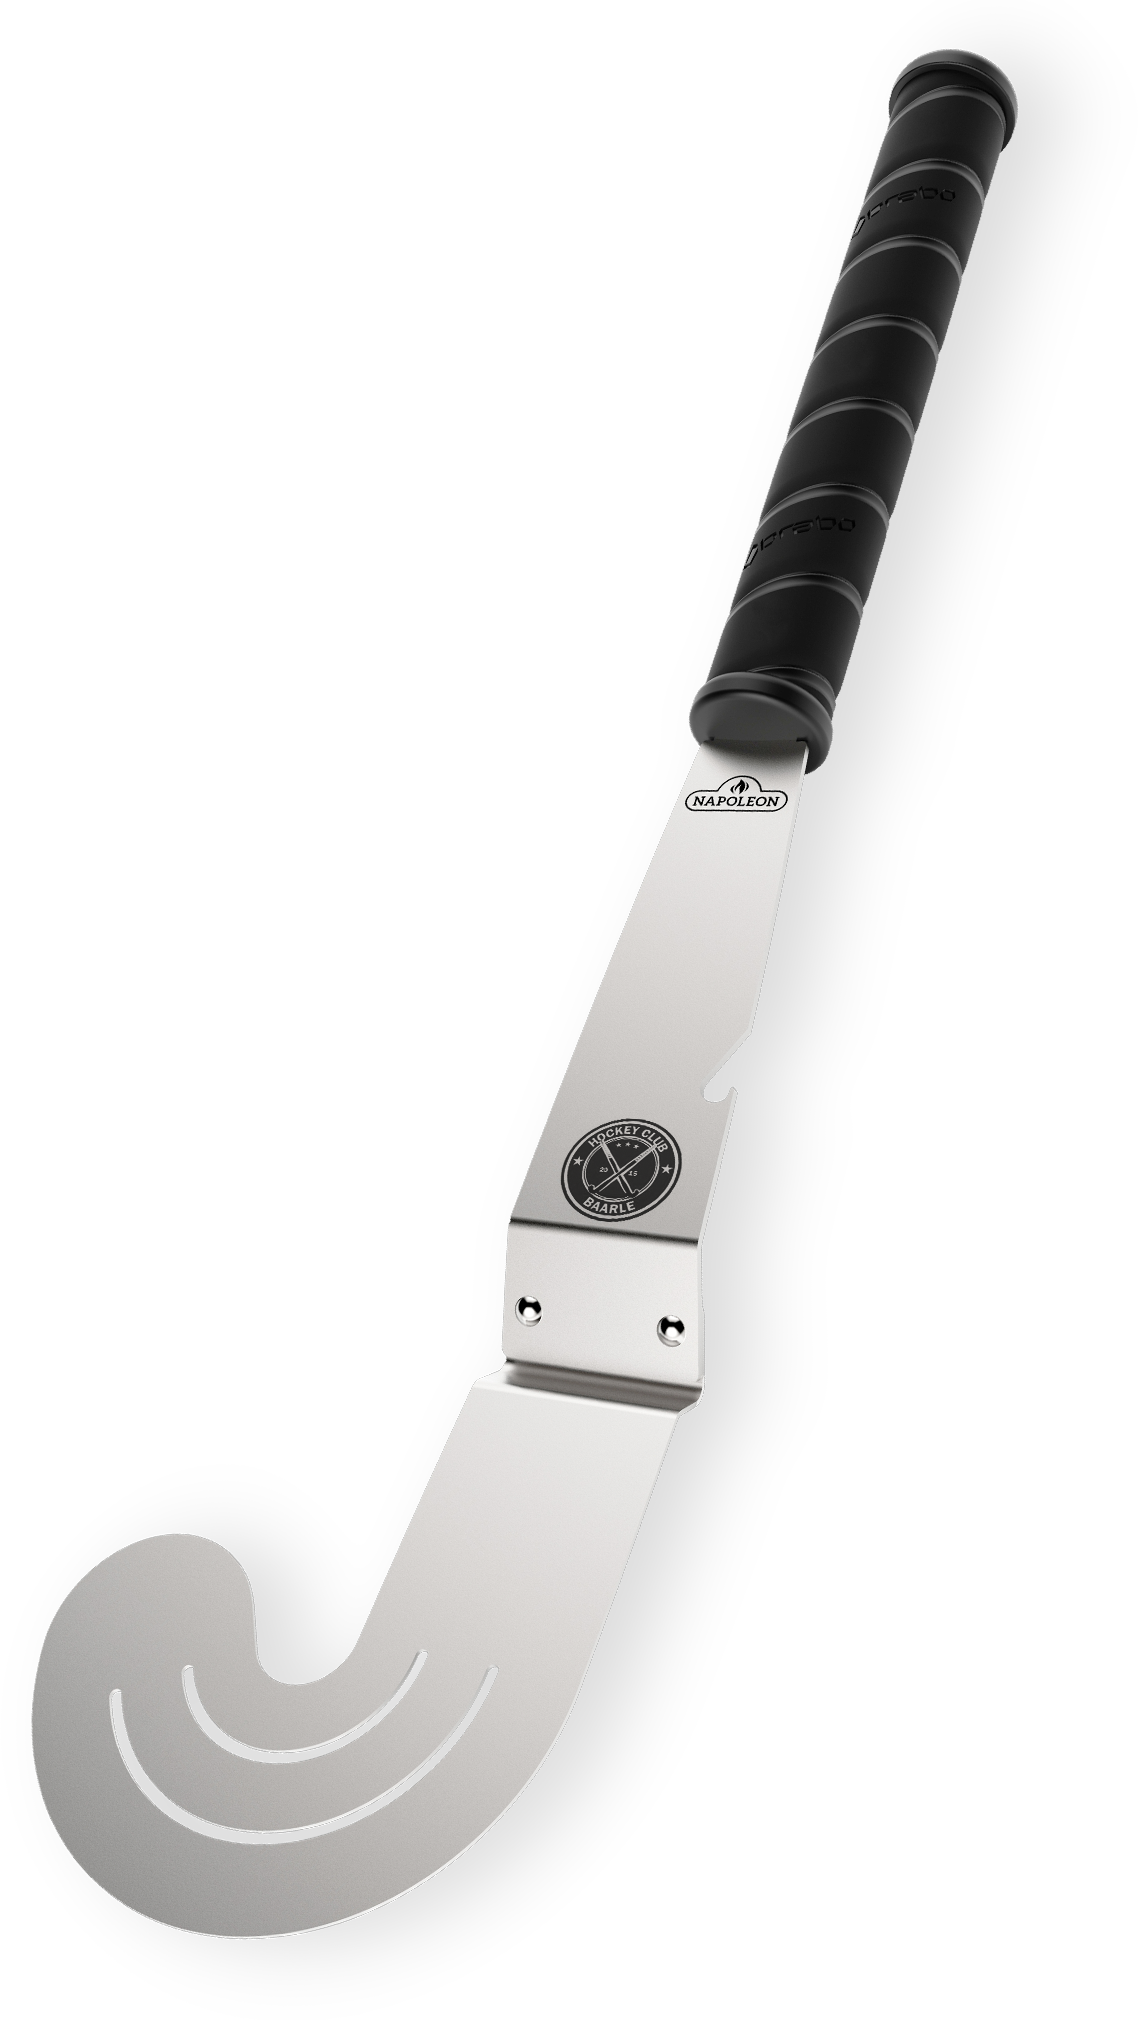 HC Baarle Hockey BBQ Stick